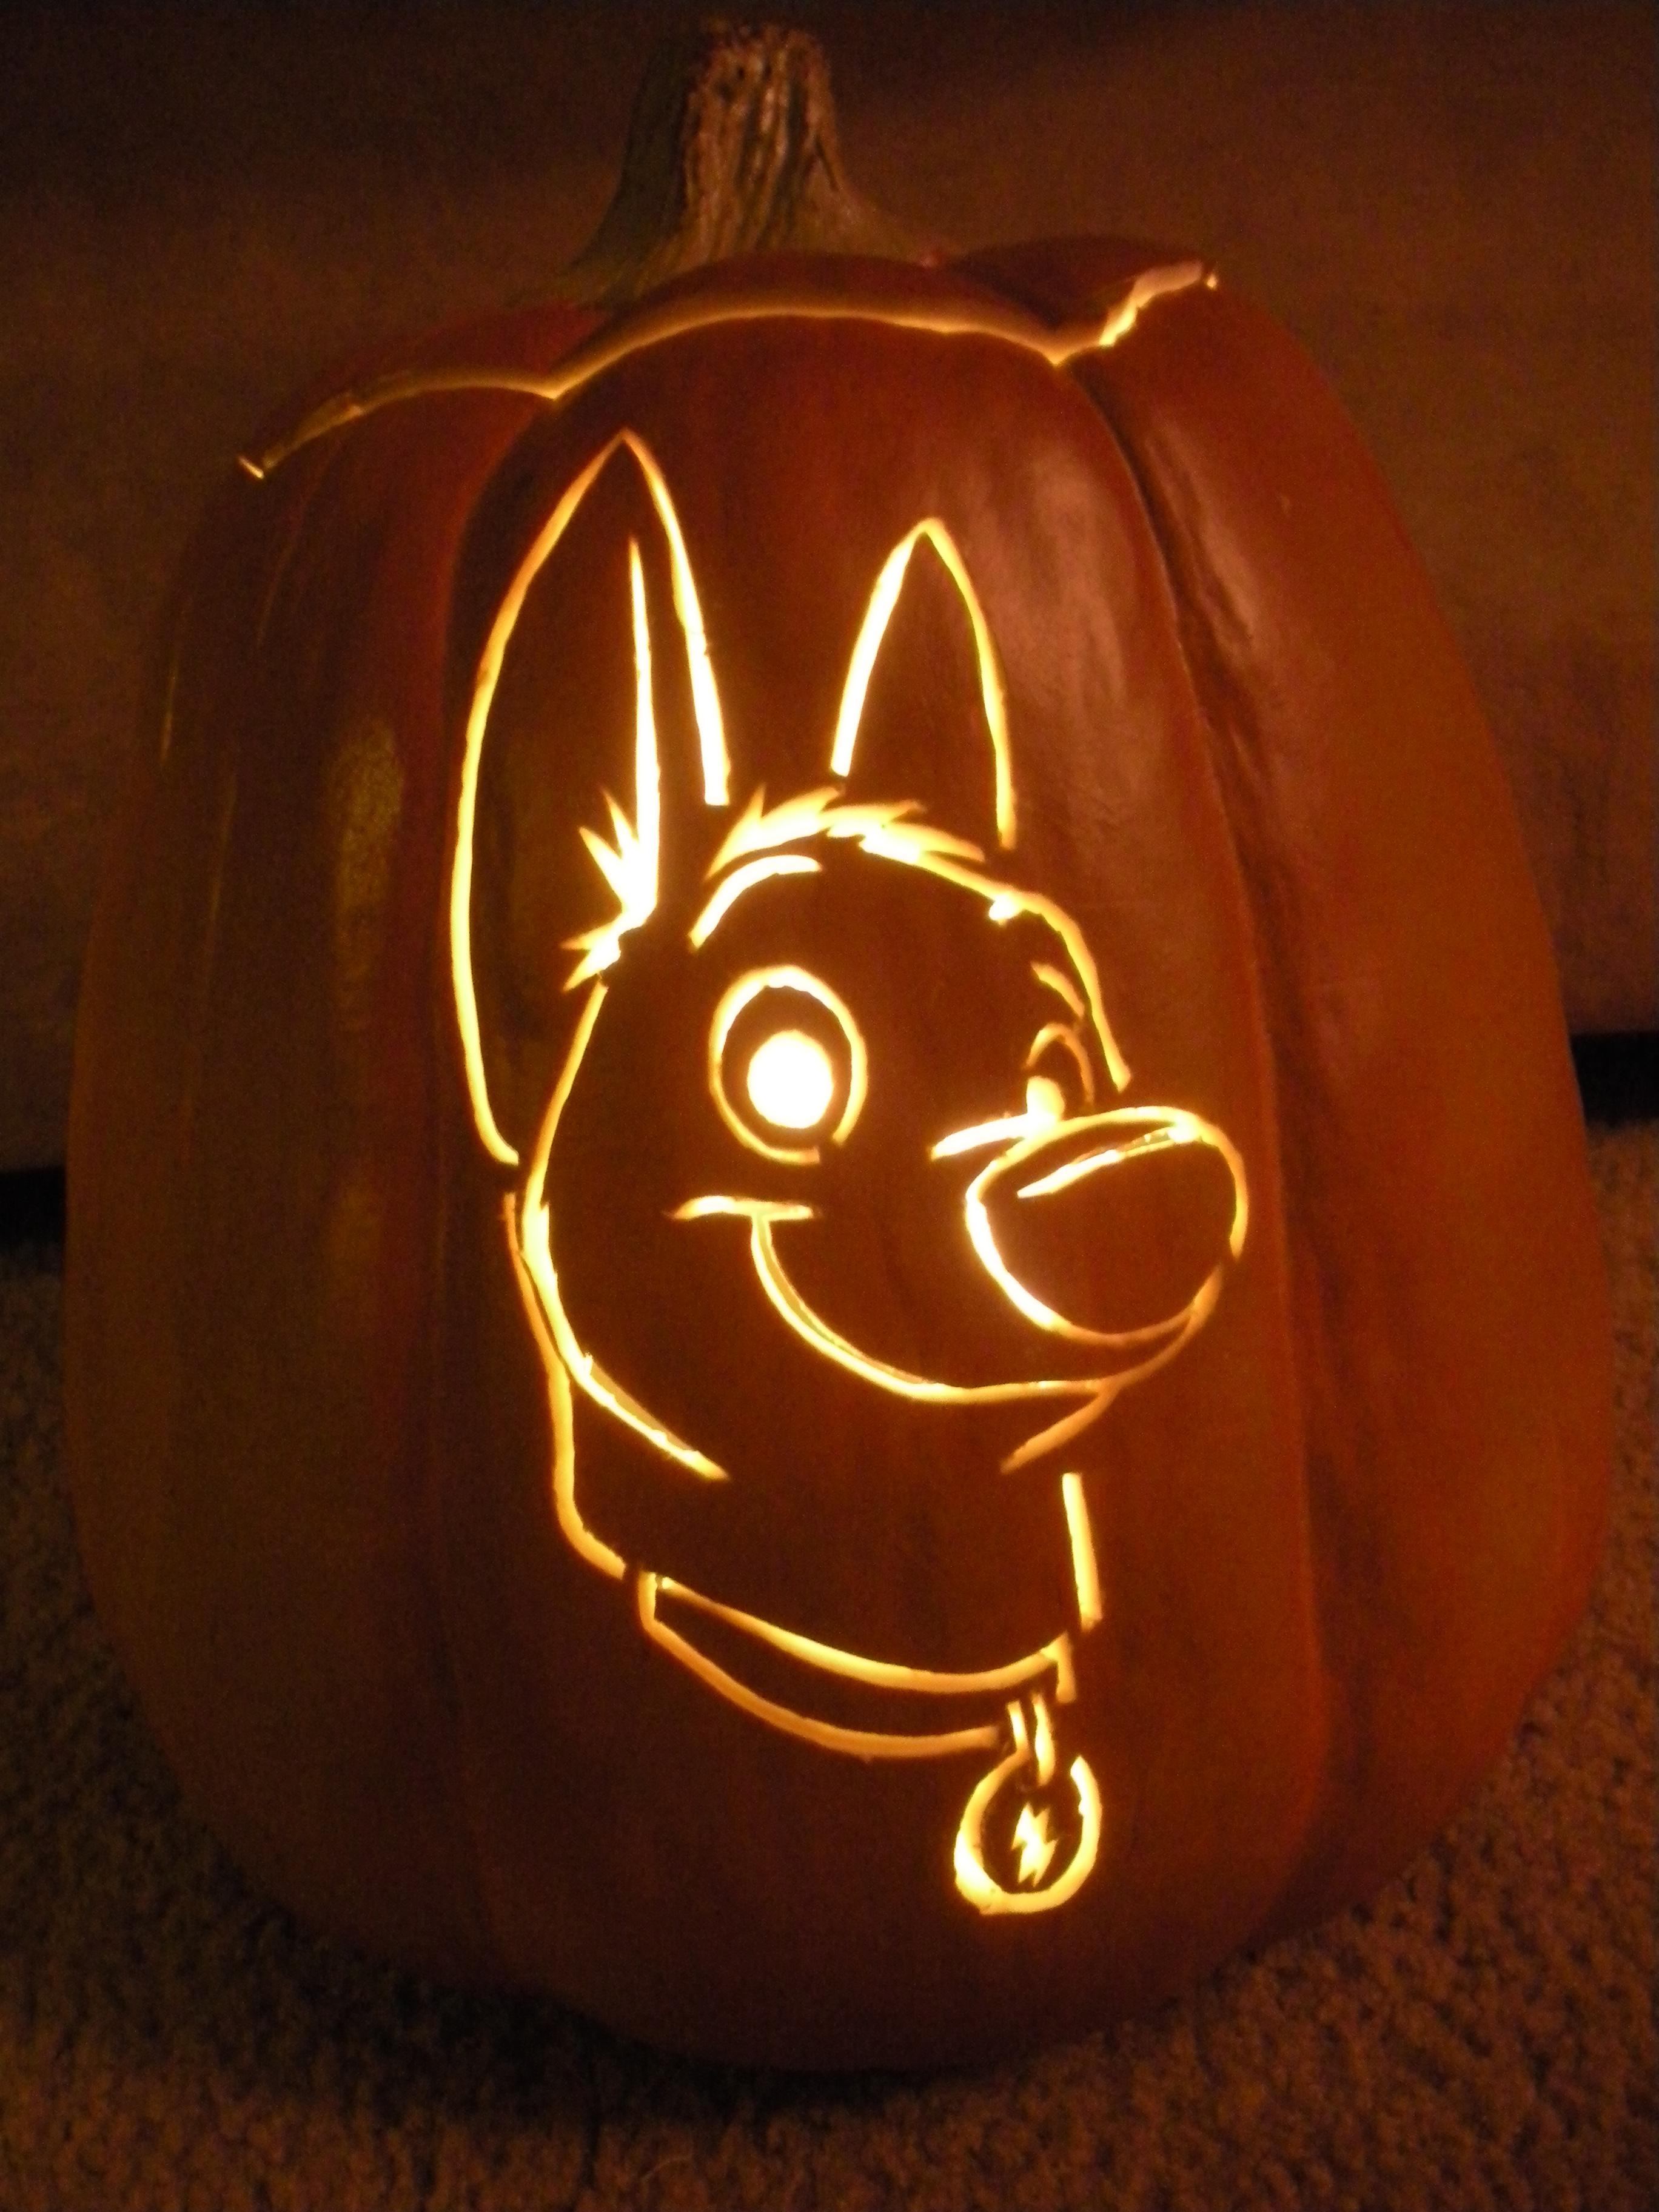 Bolt Pumpkin Carving by acappellasaurus on DeviantArt